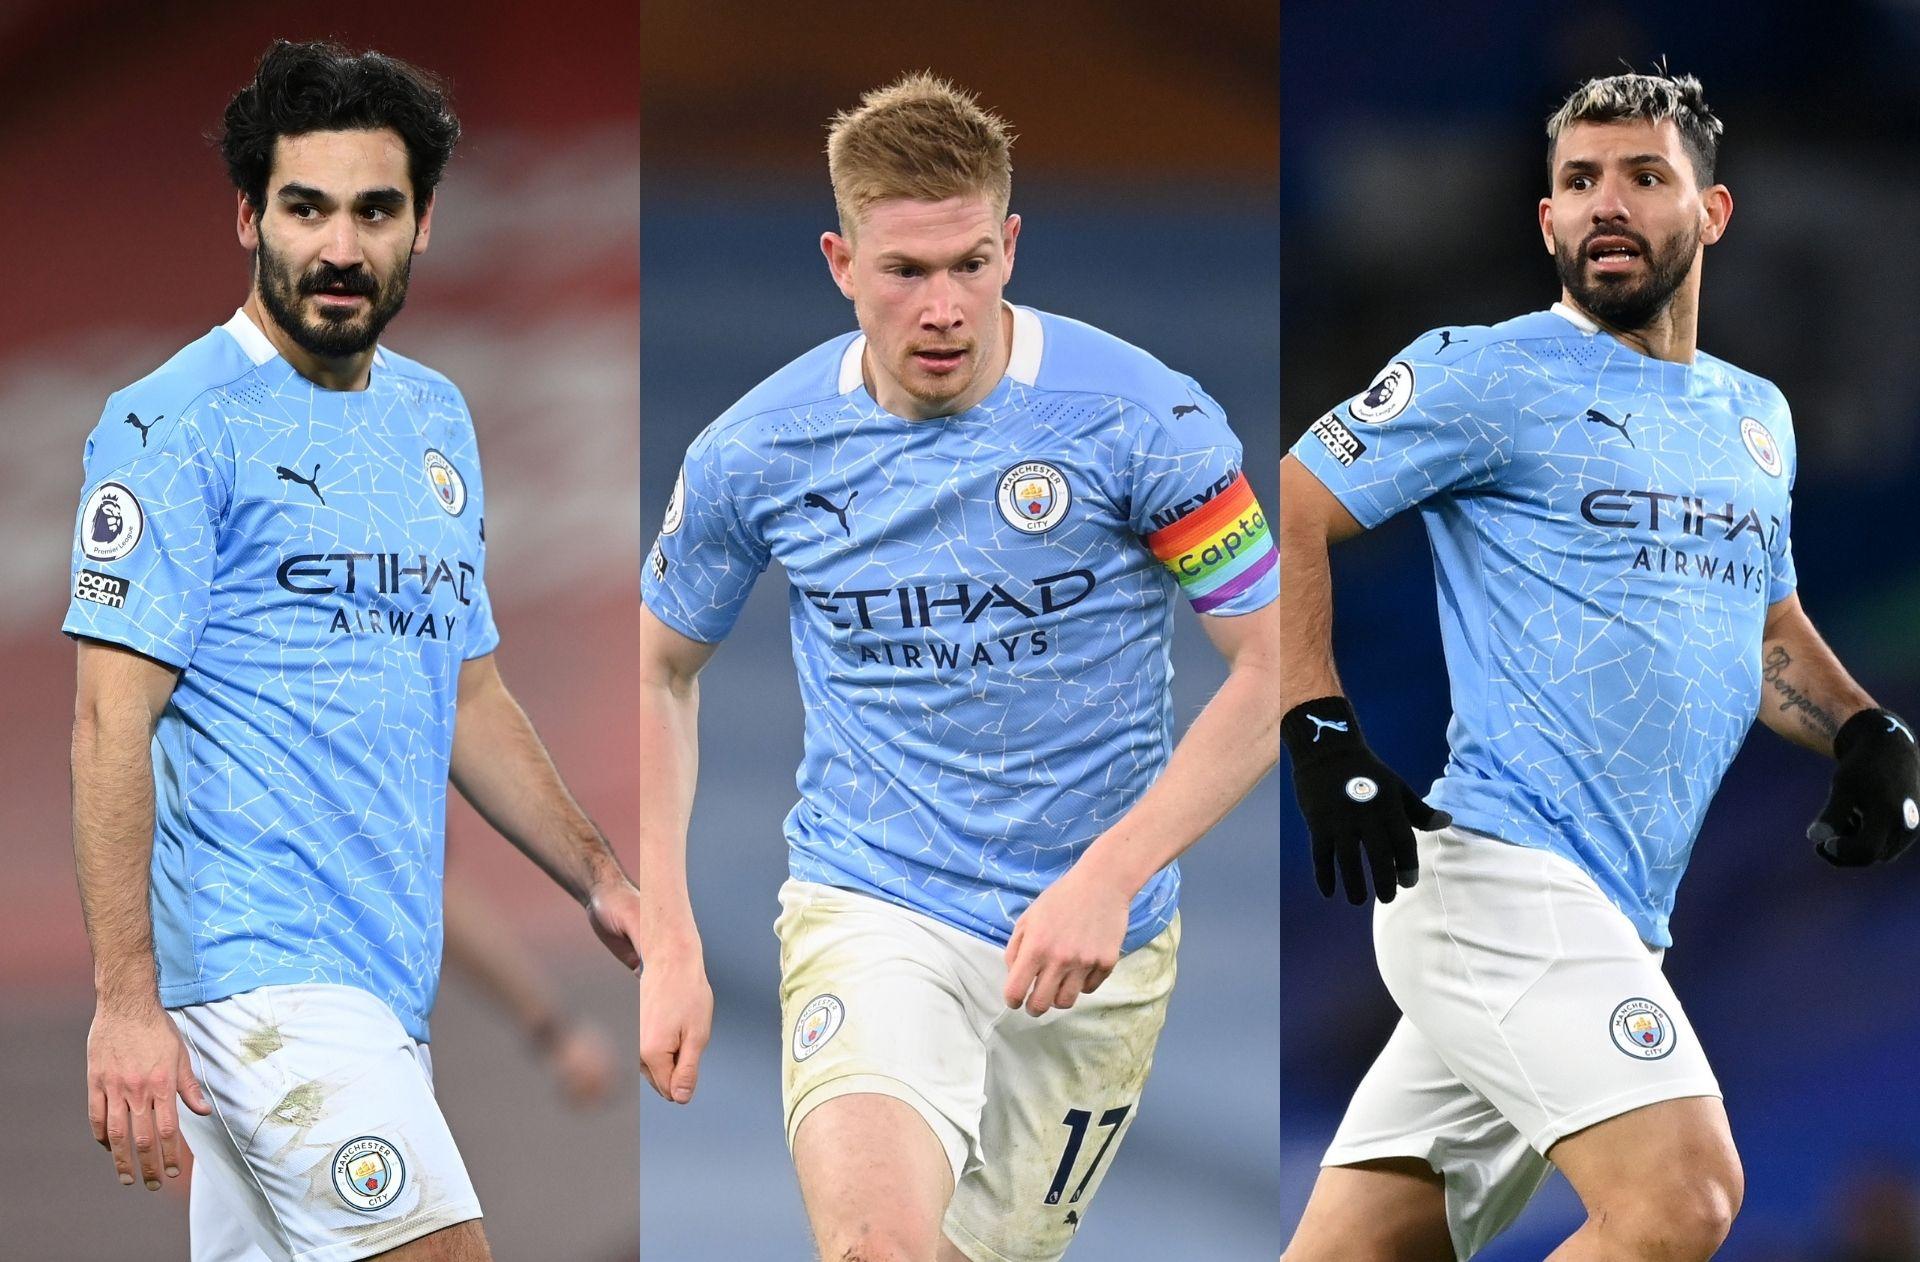 Ilkay Gundogan Kevin De Bruyne Sergio Aguero - Manchester City